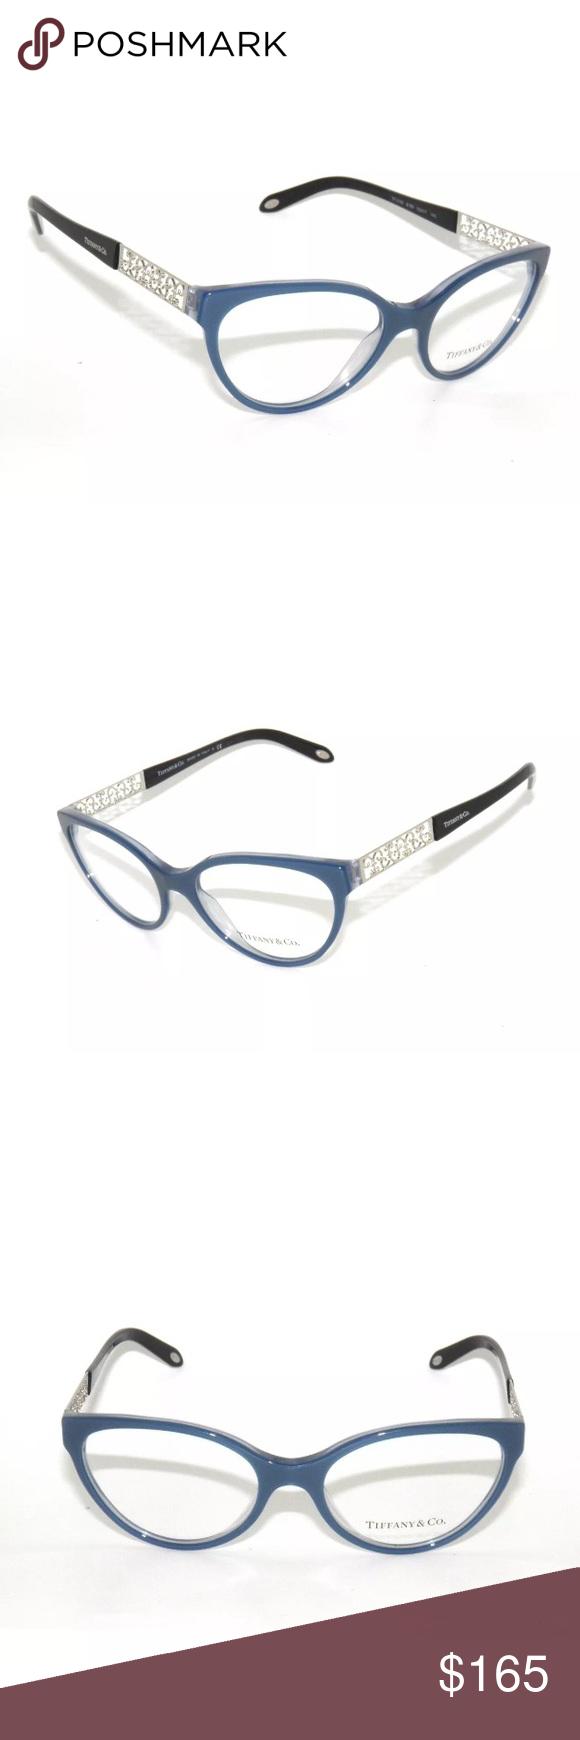 6e93e4e8c931 Tiffany Eyeglasses Pearl blue 2129 In excellent condition Comes with Tiffany  case Authentic. Tiffany   Co. Accessories Glasses